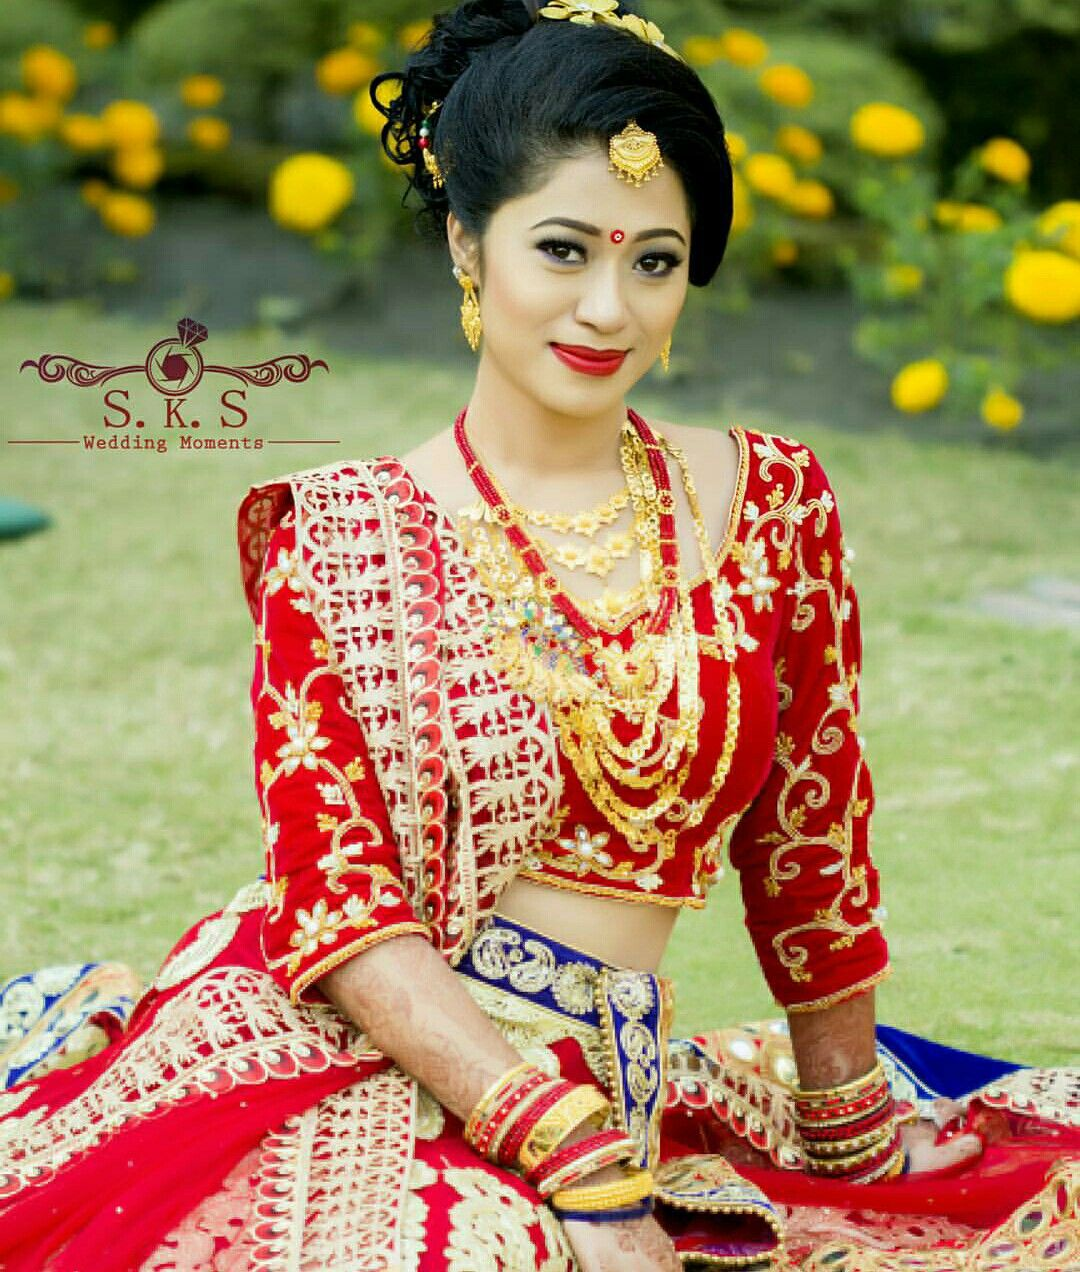 Nepali Wedding Tradition Nepal Marriage Bride Makeup Simple Saree Dress Bridal Lehenga Red Bride Indian Bride